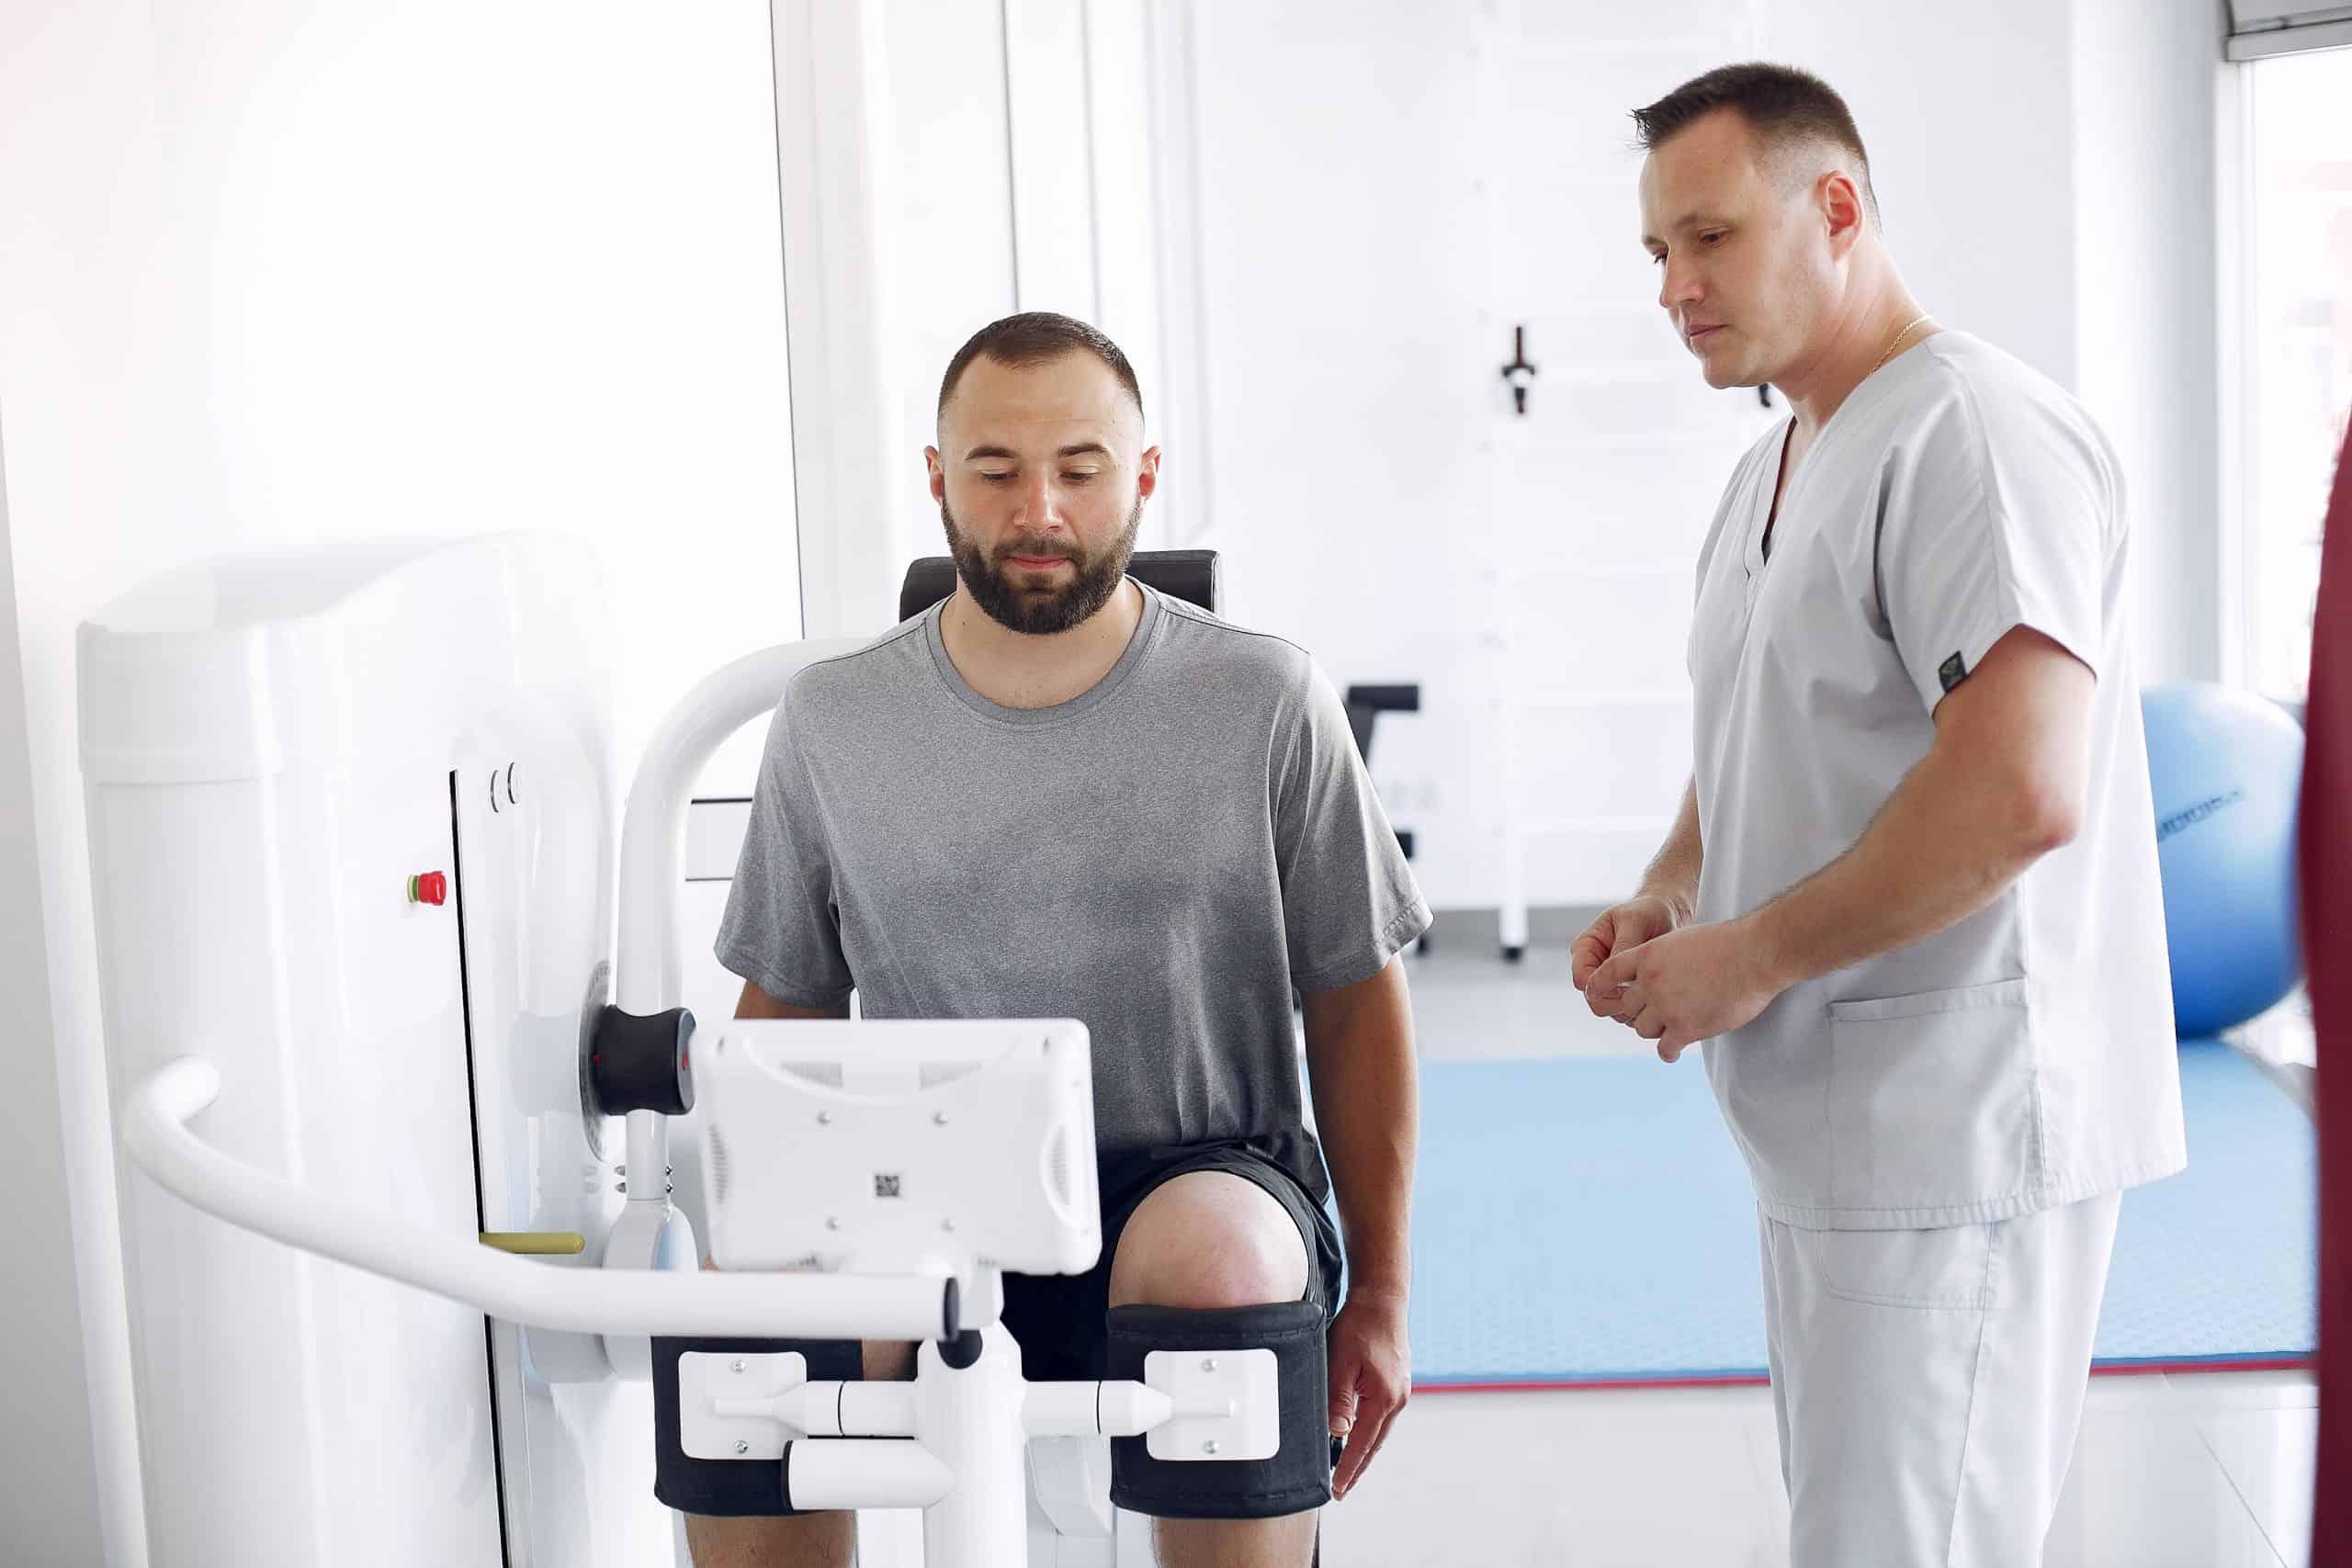 Physiothérapie, Kinésiologie, Ostéopathie et assurance complémentaire